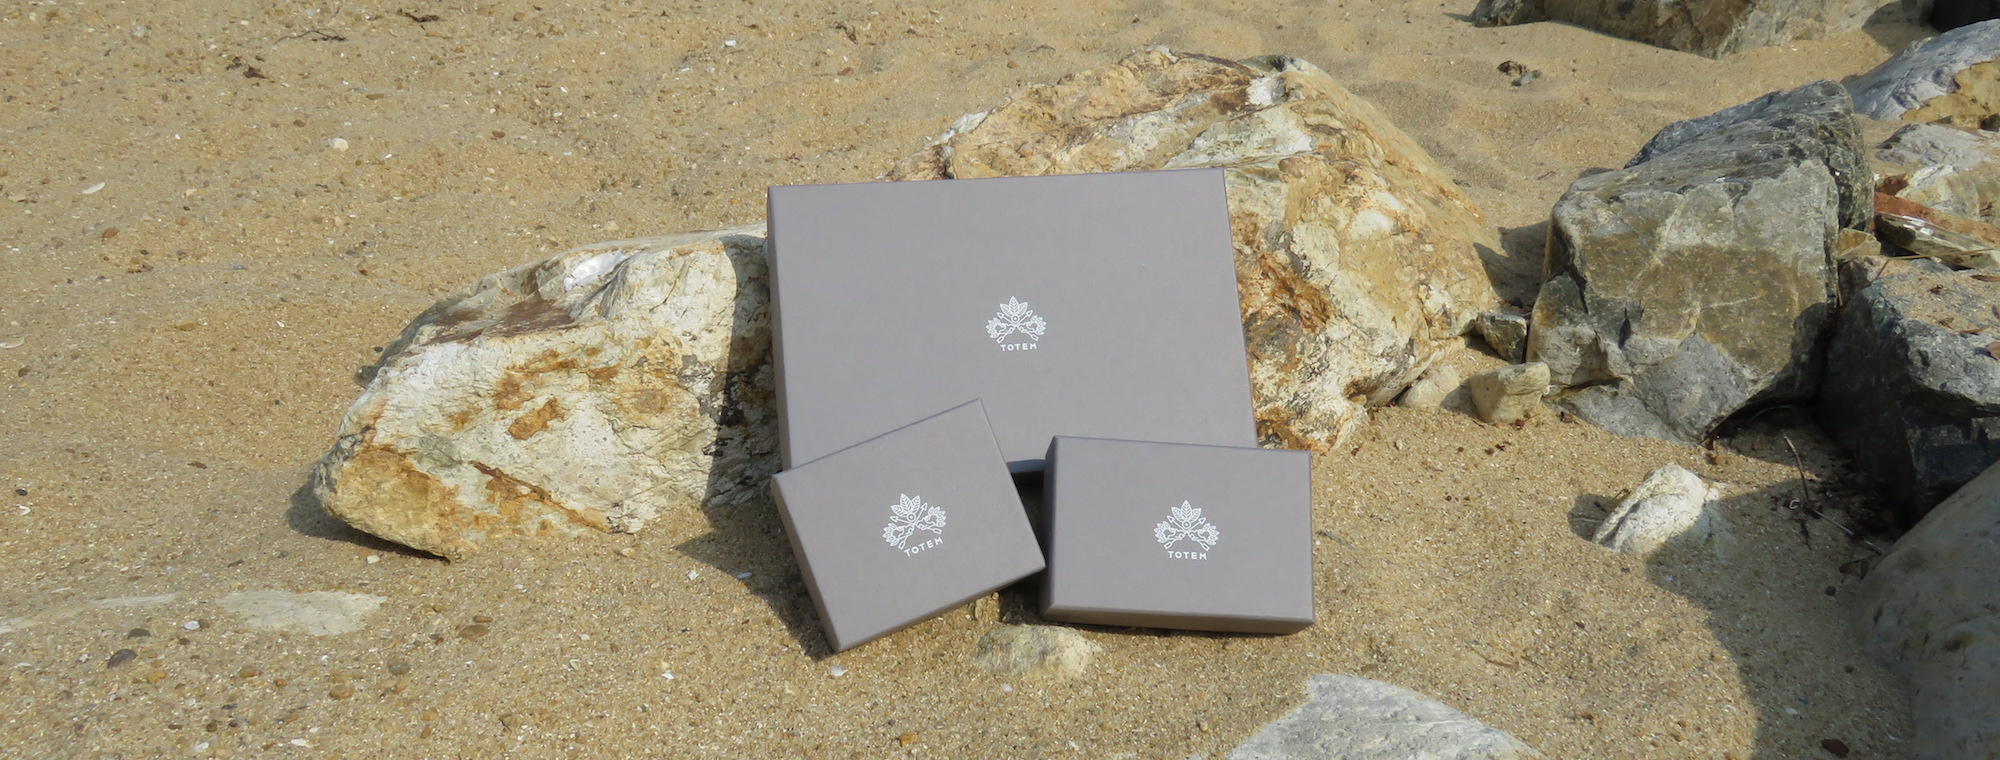 Totem packaging